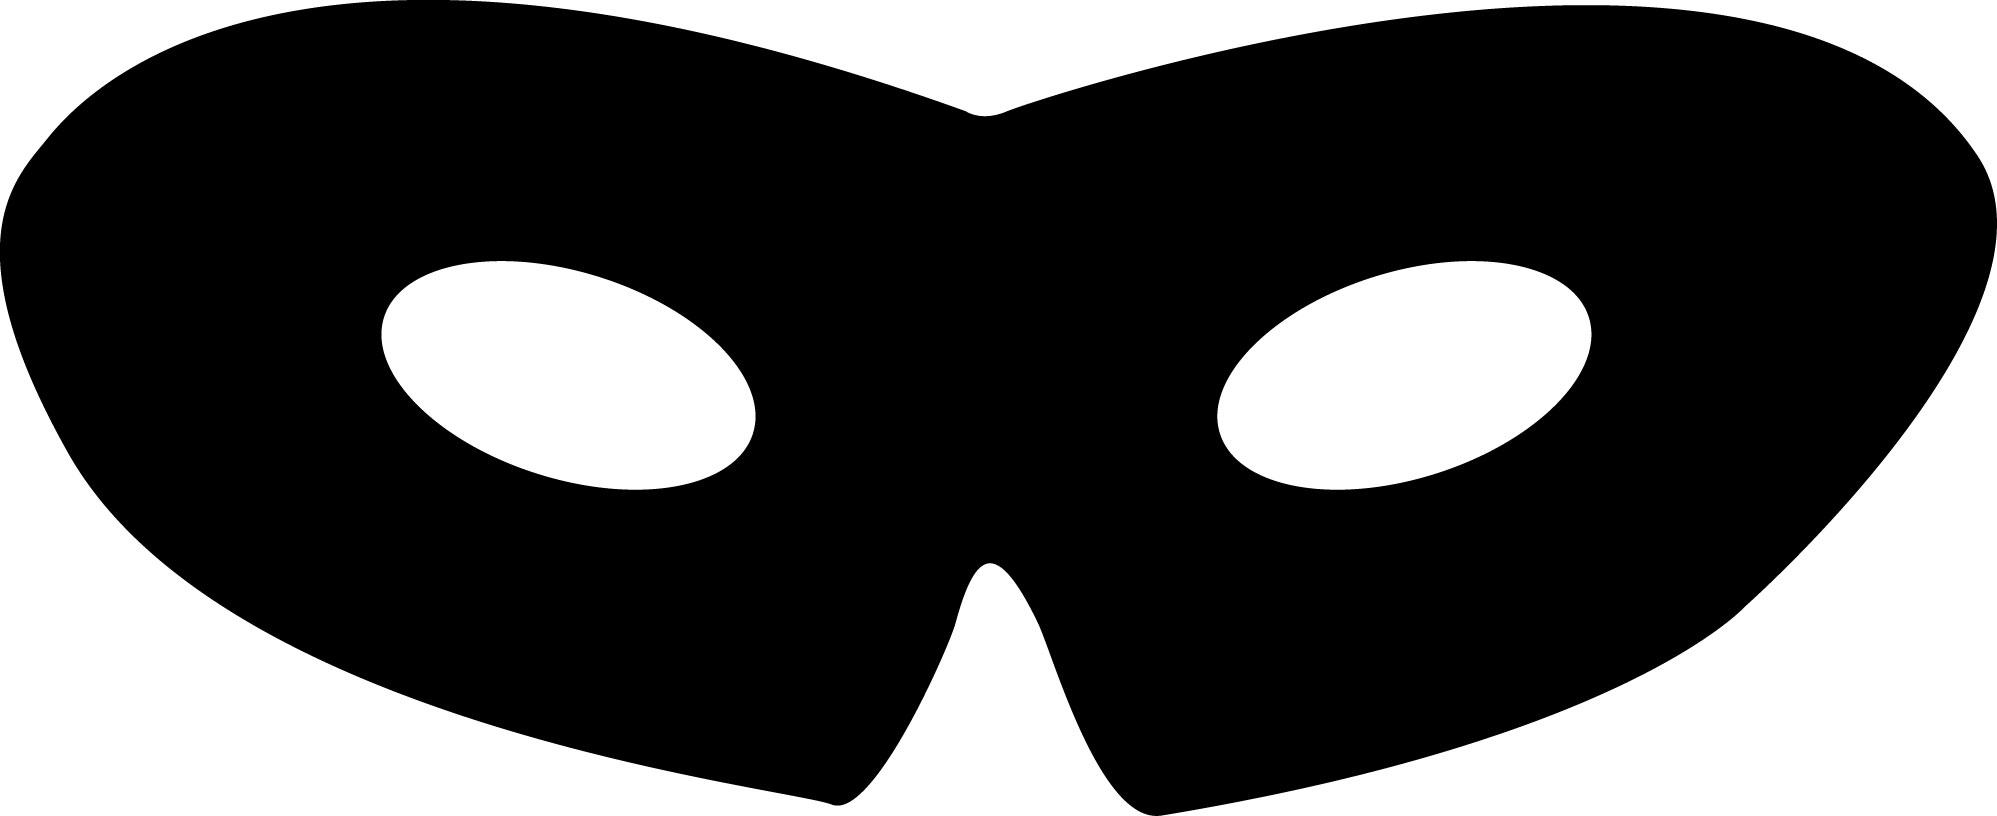 Carnival clipart eye mask Clip Free Eye  mask